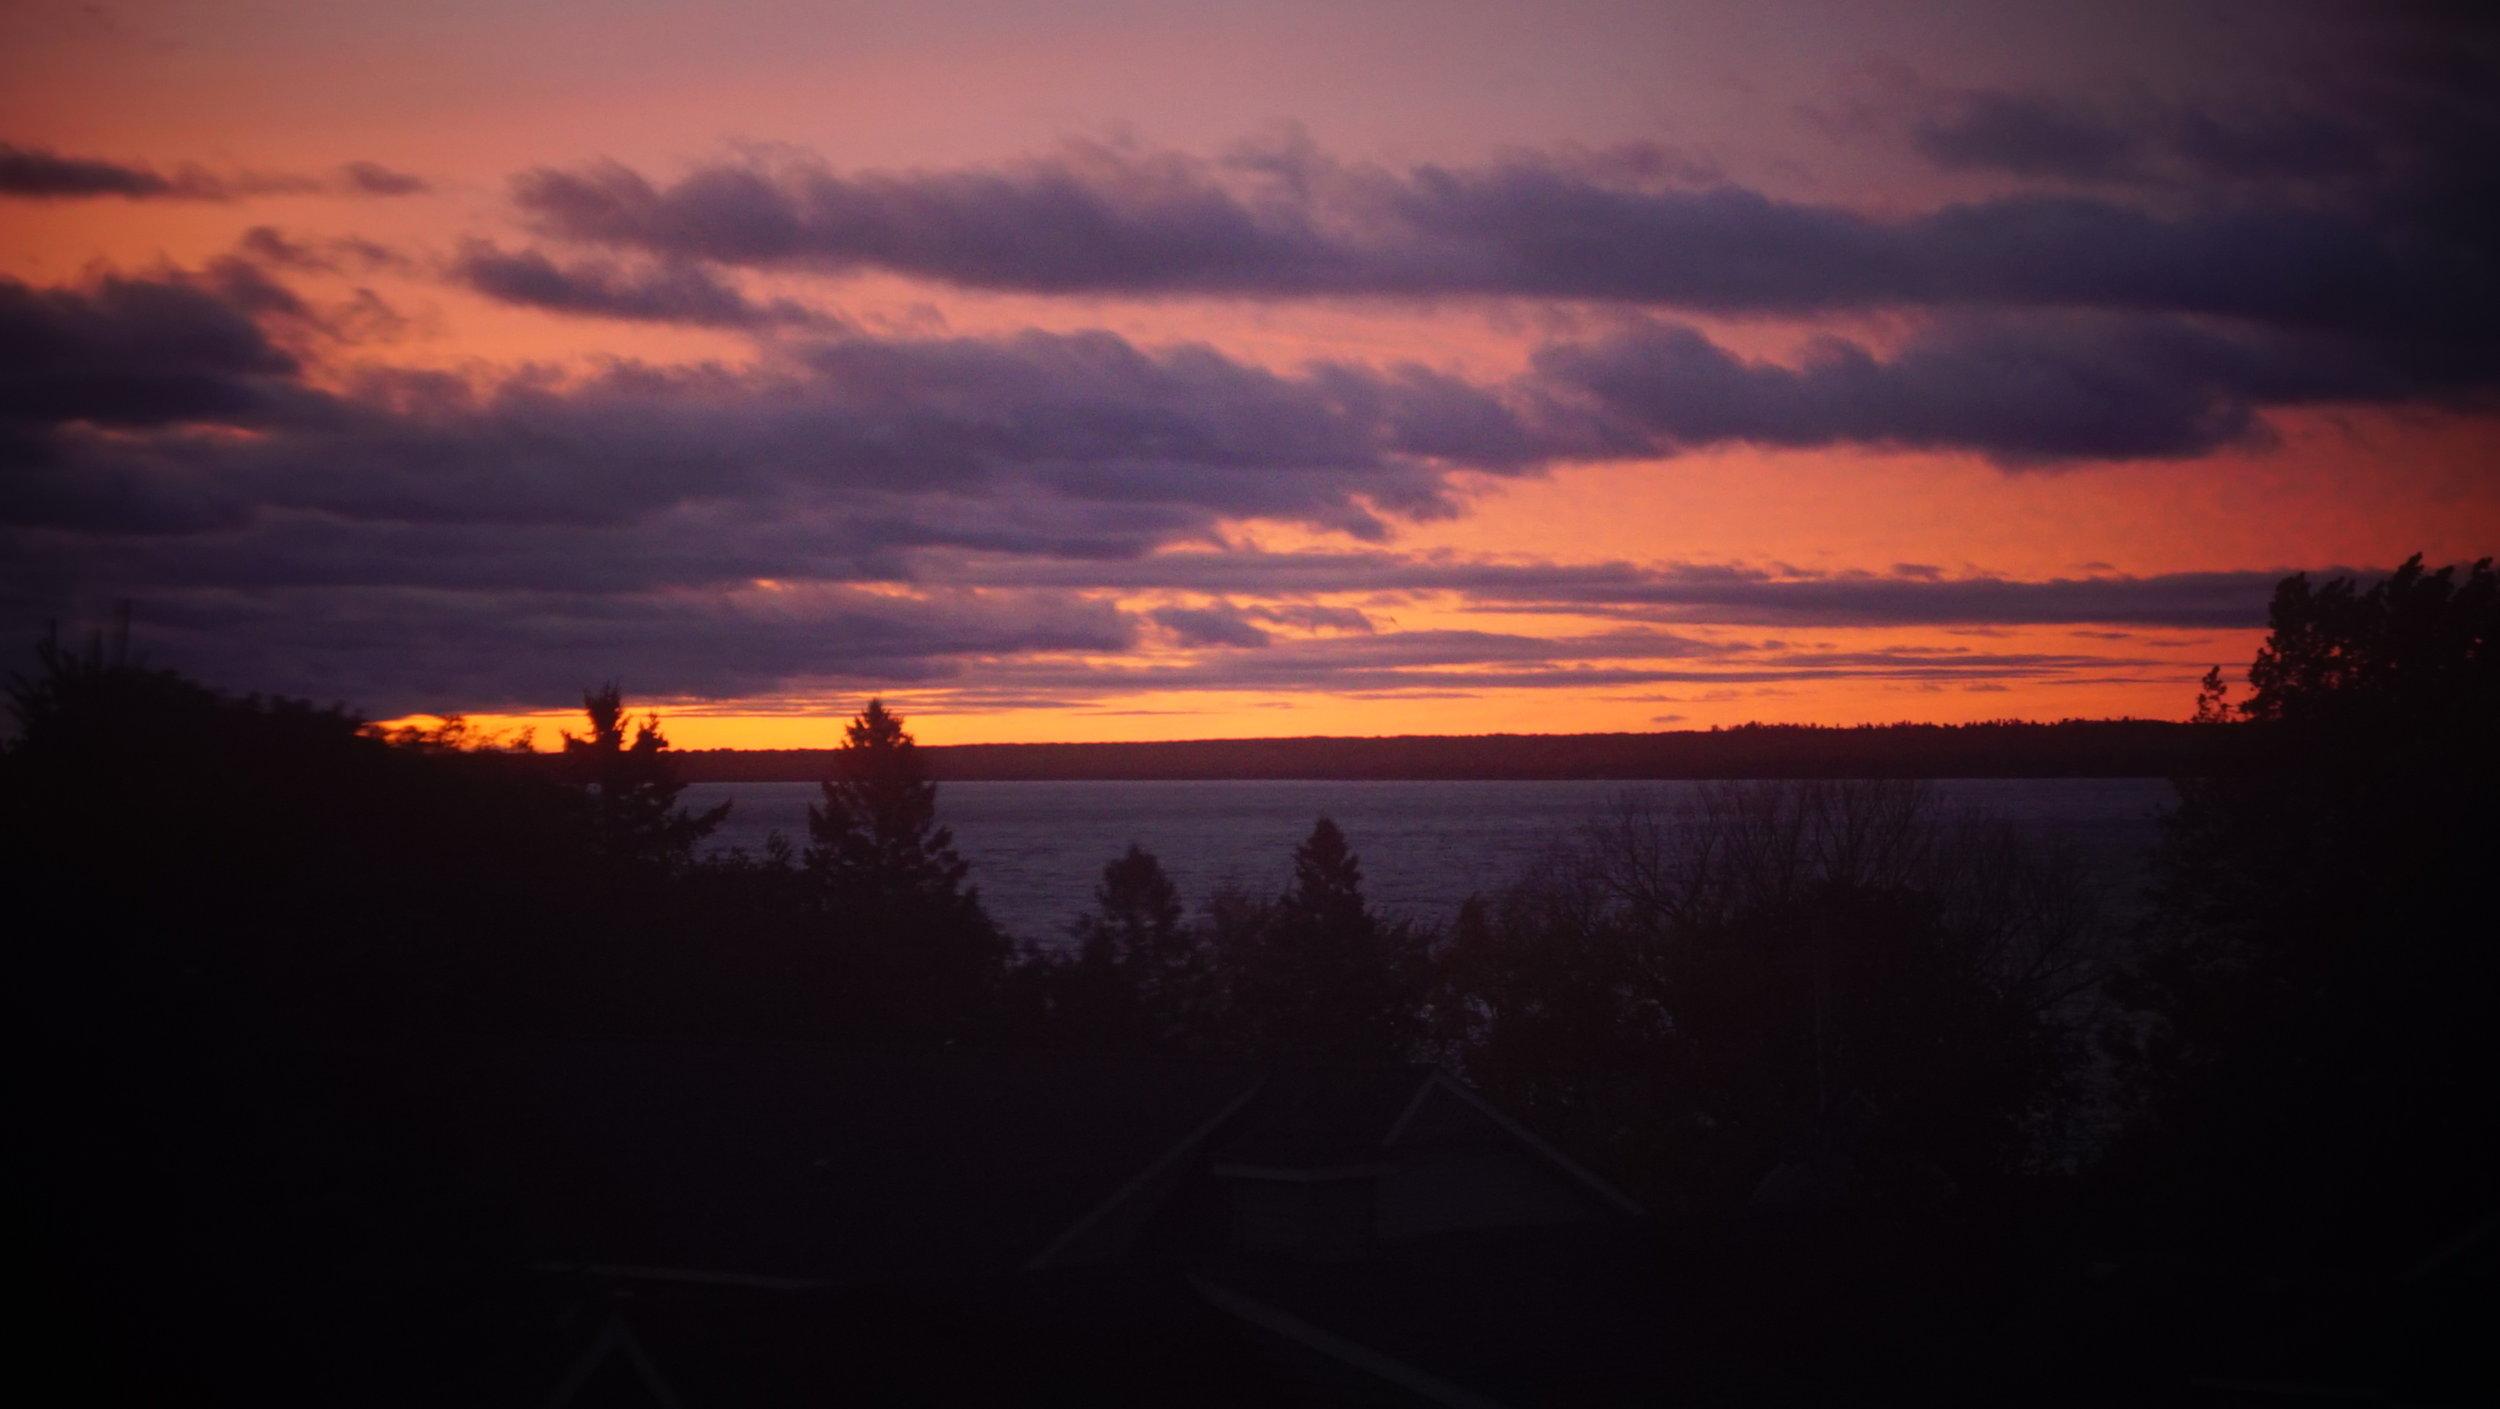 Petri 55mm f1.8 - Straits of Mackinac - Mackinac Island, MI - Photo by: Keith Nickoson